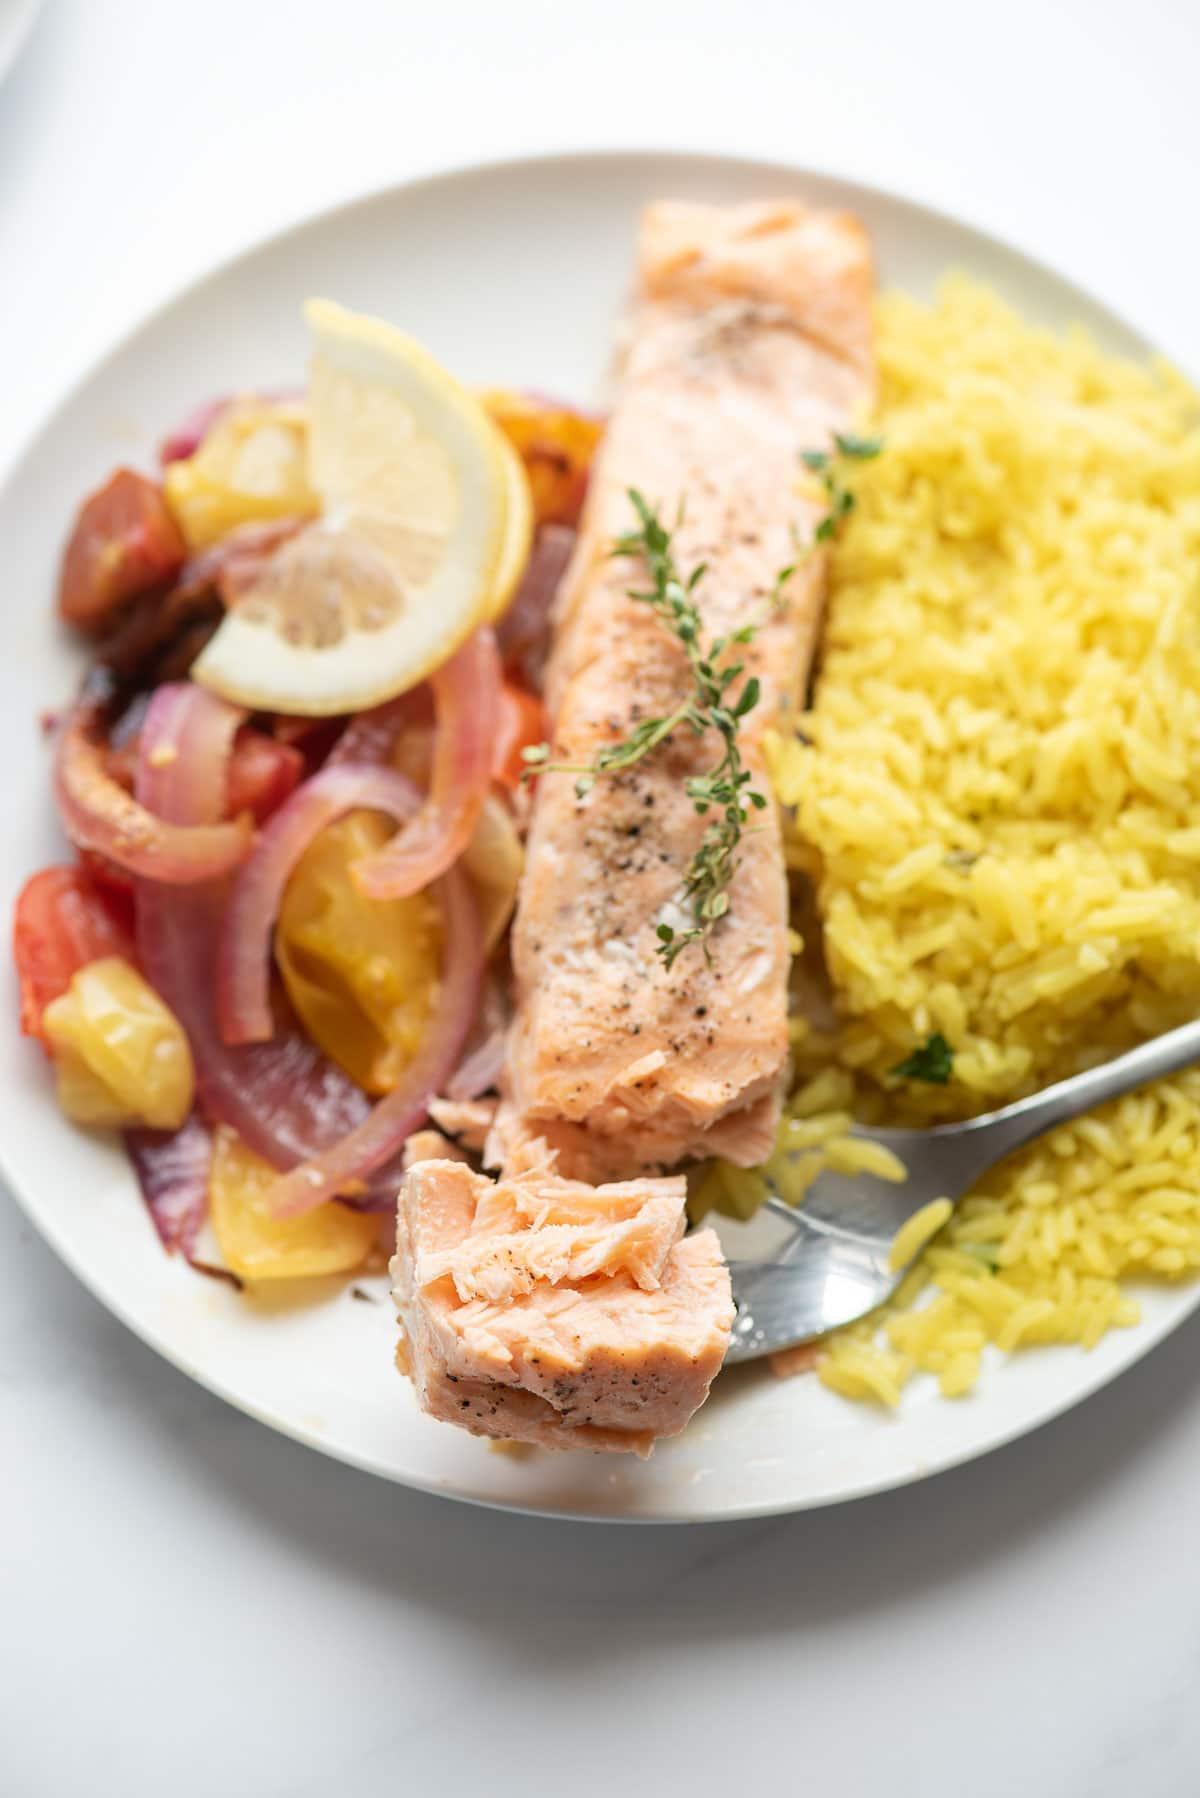 bite of salmon on fork